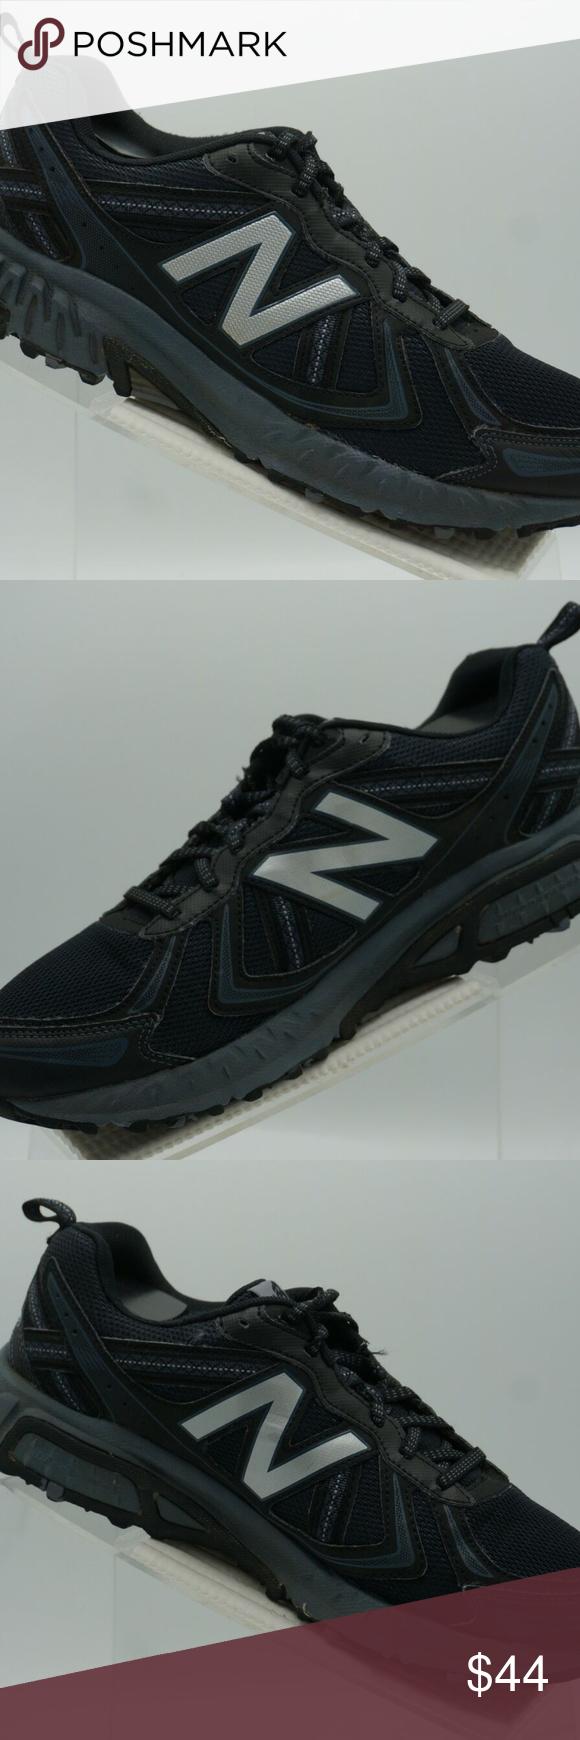 New Balance MT410LB5 Size 9.5 D Black